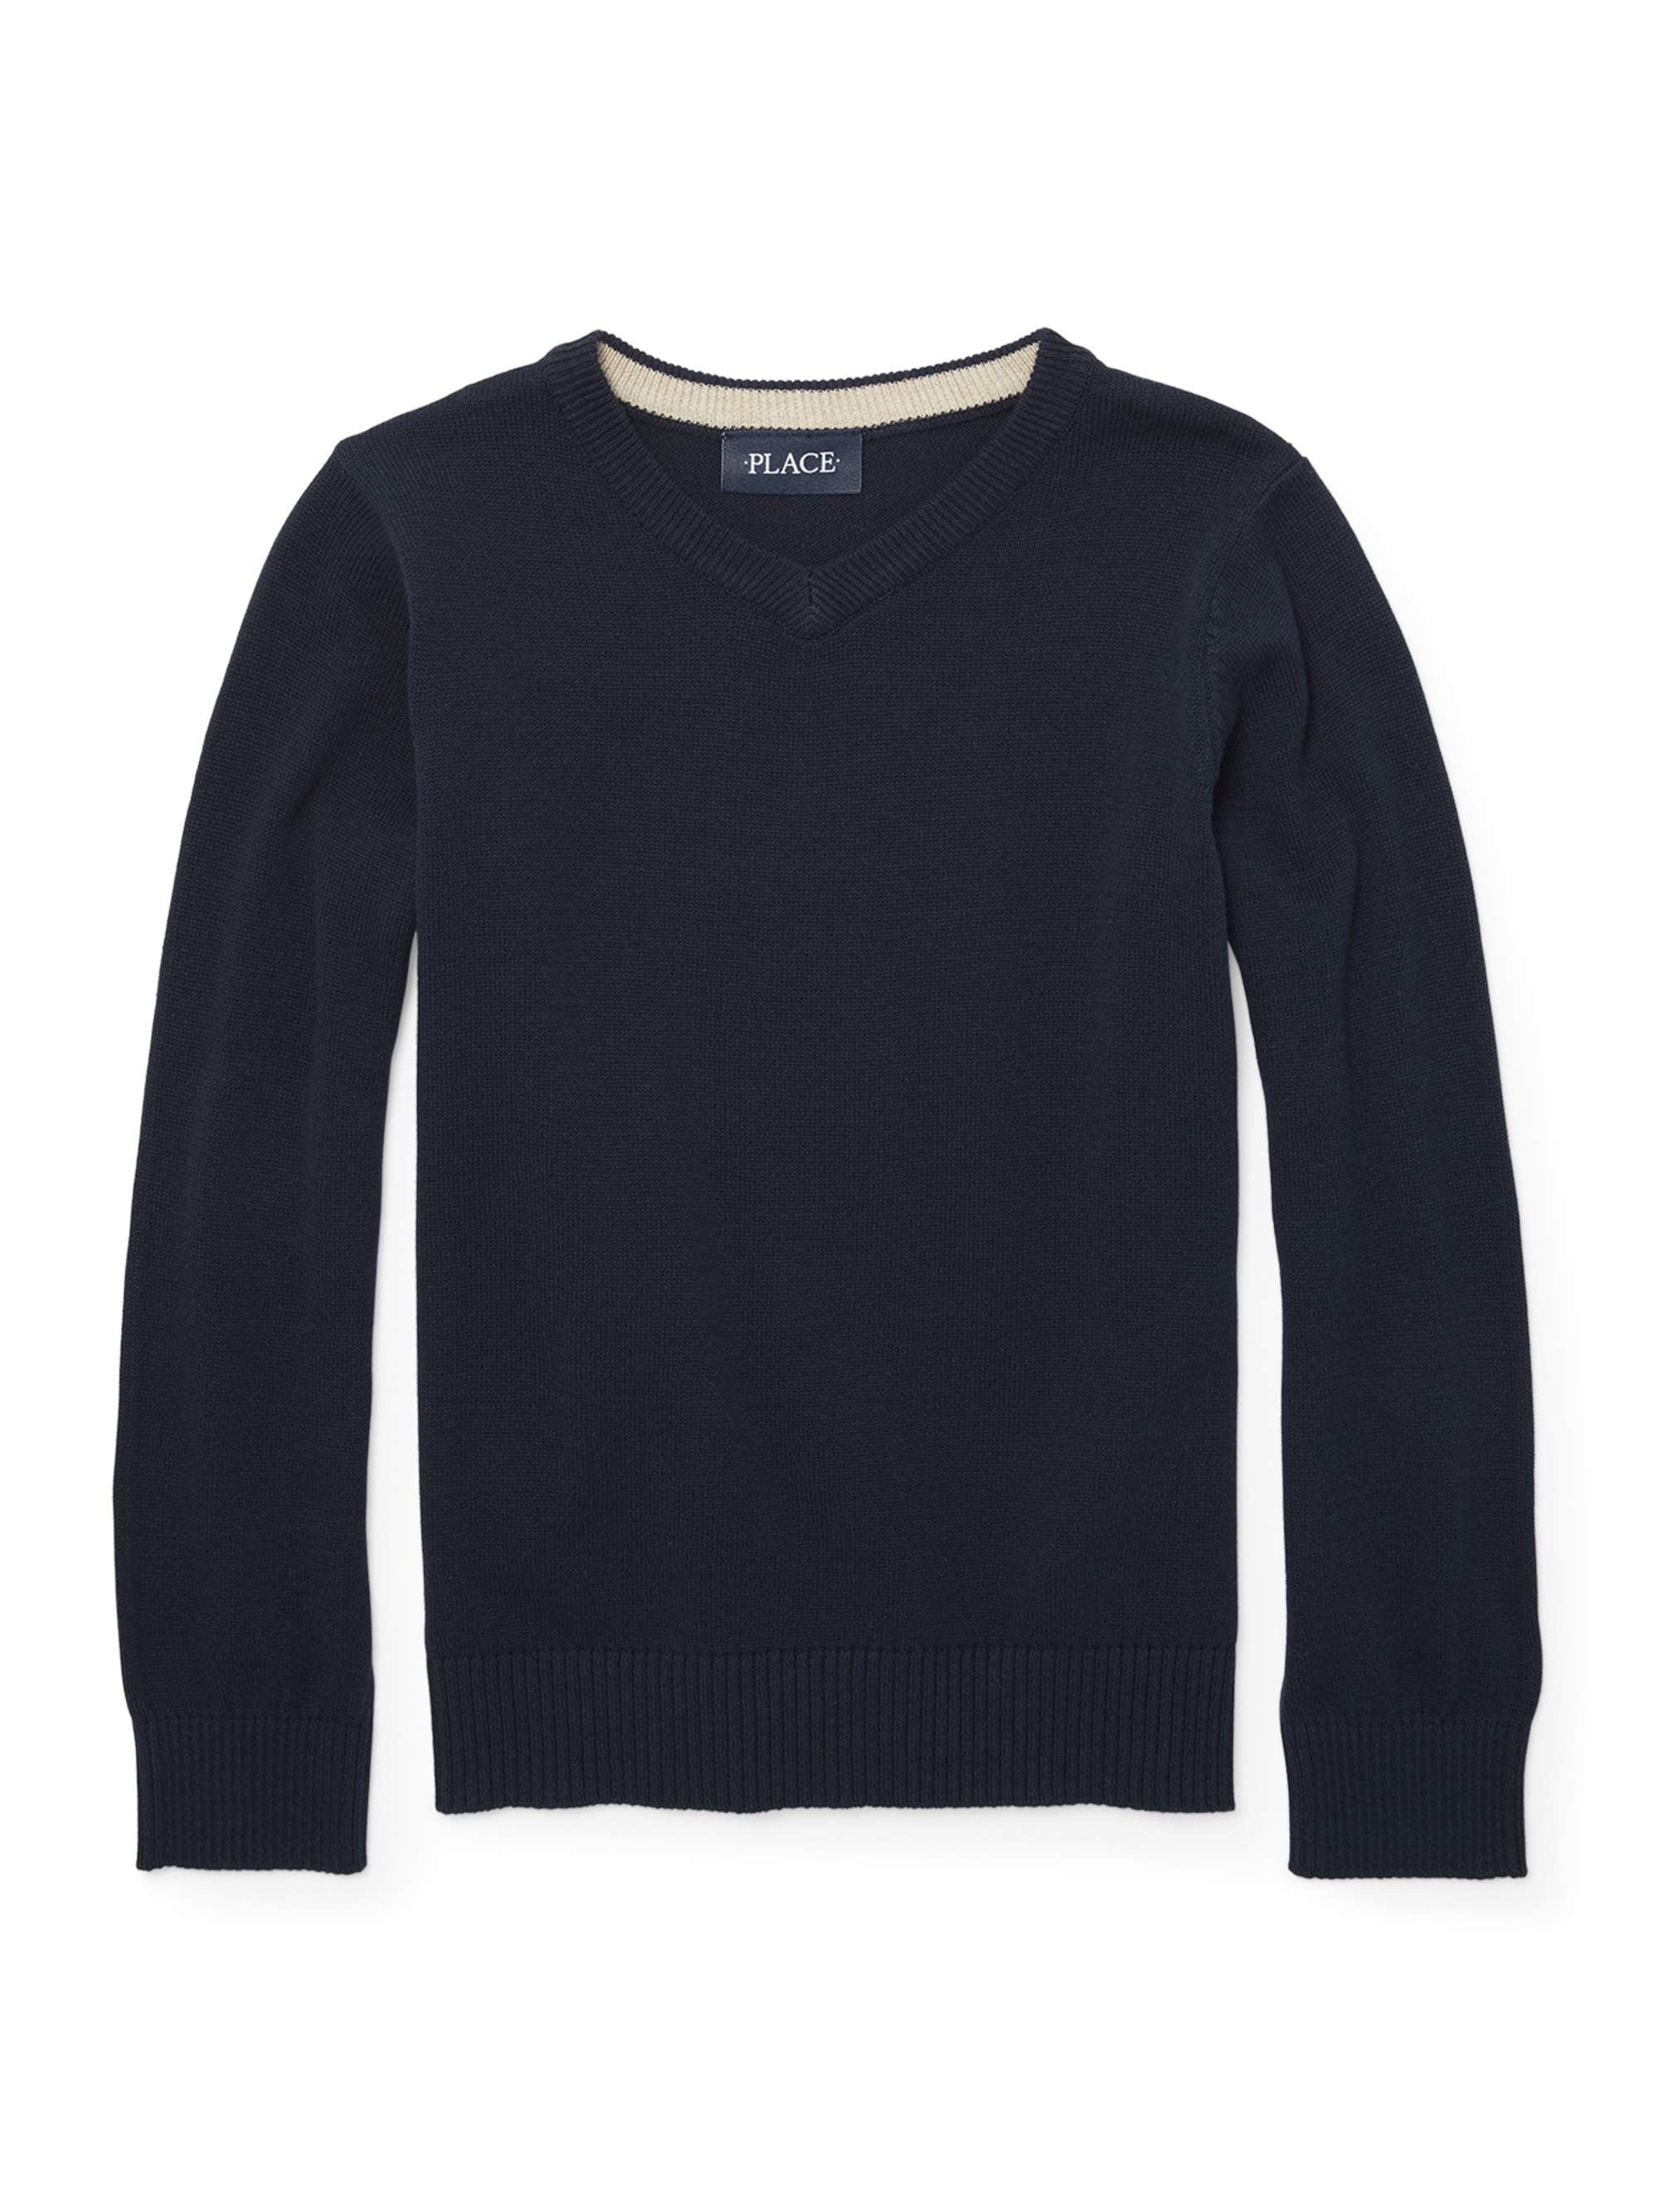 Long Sleeve V-neck Pull on Sweater (Little Boys & Big Boys)